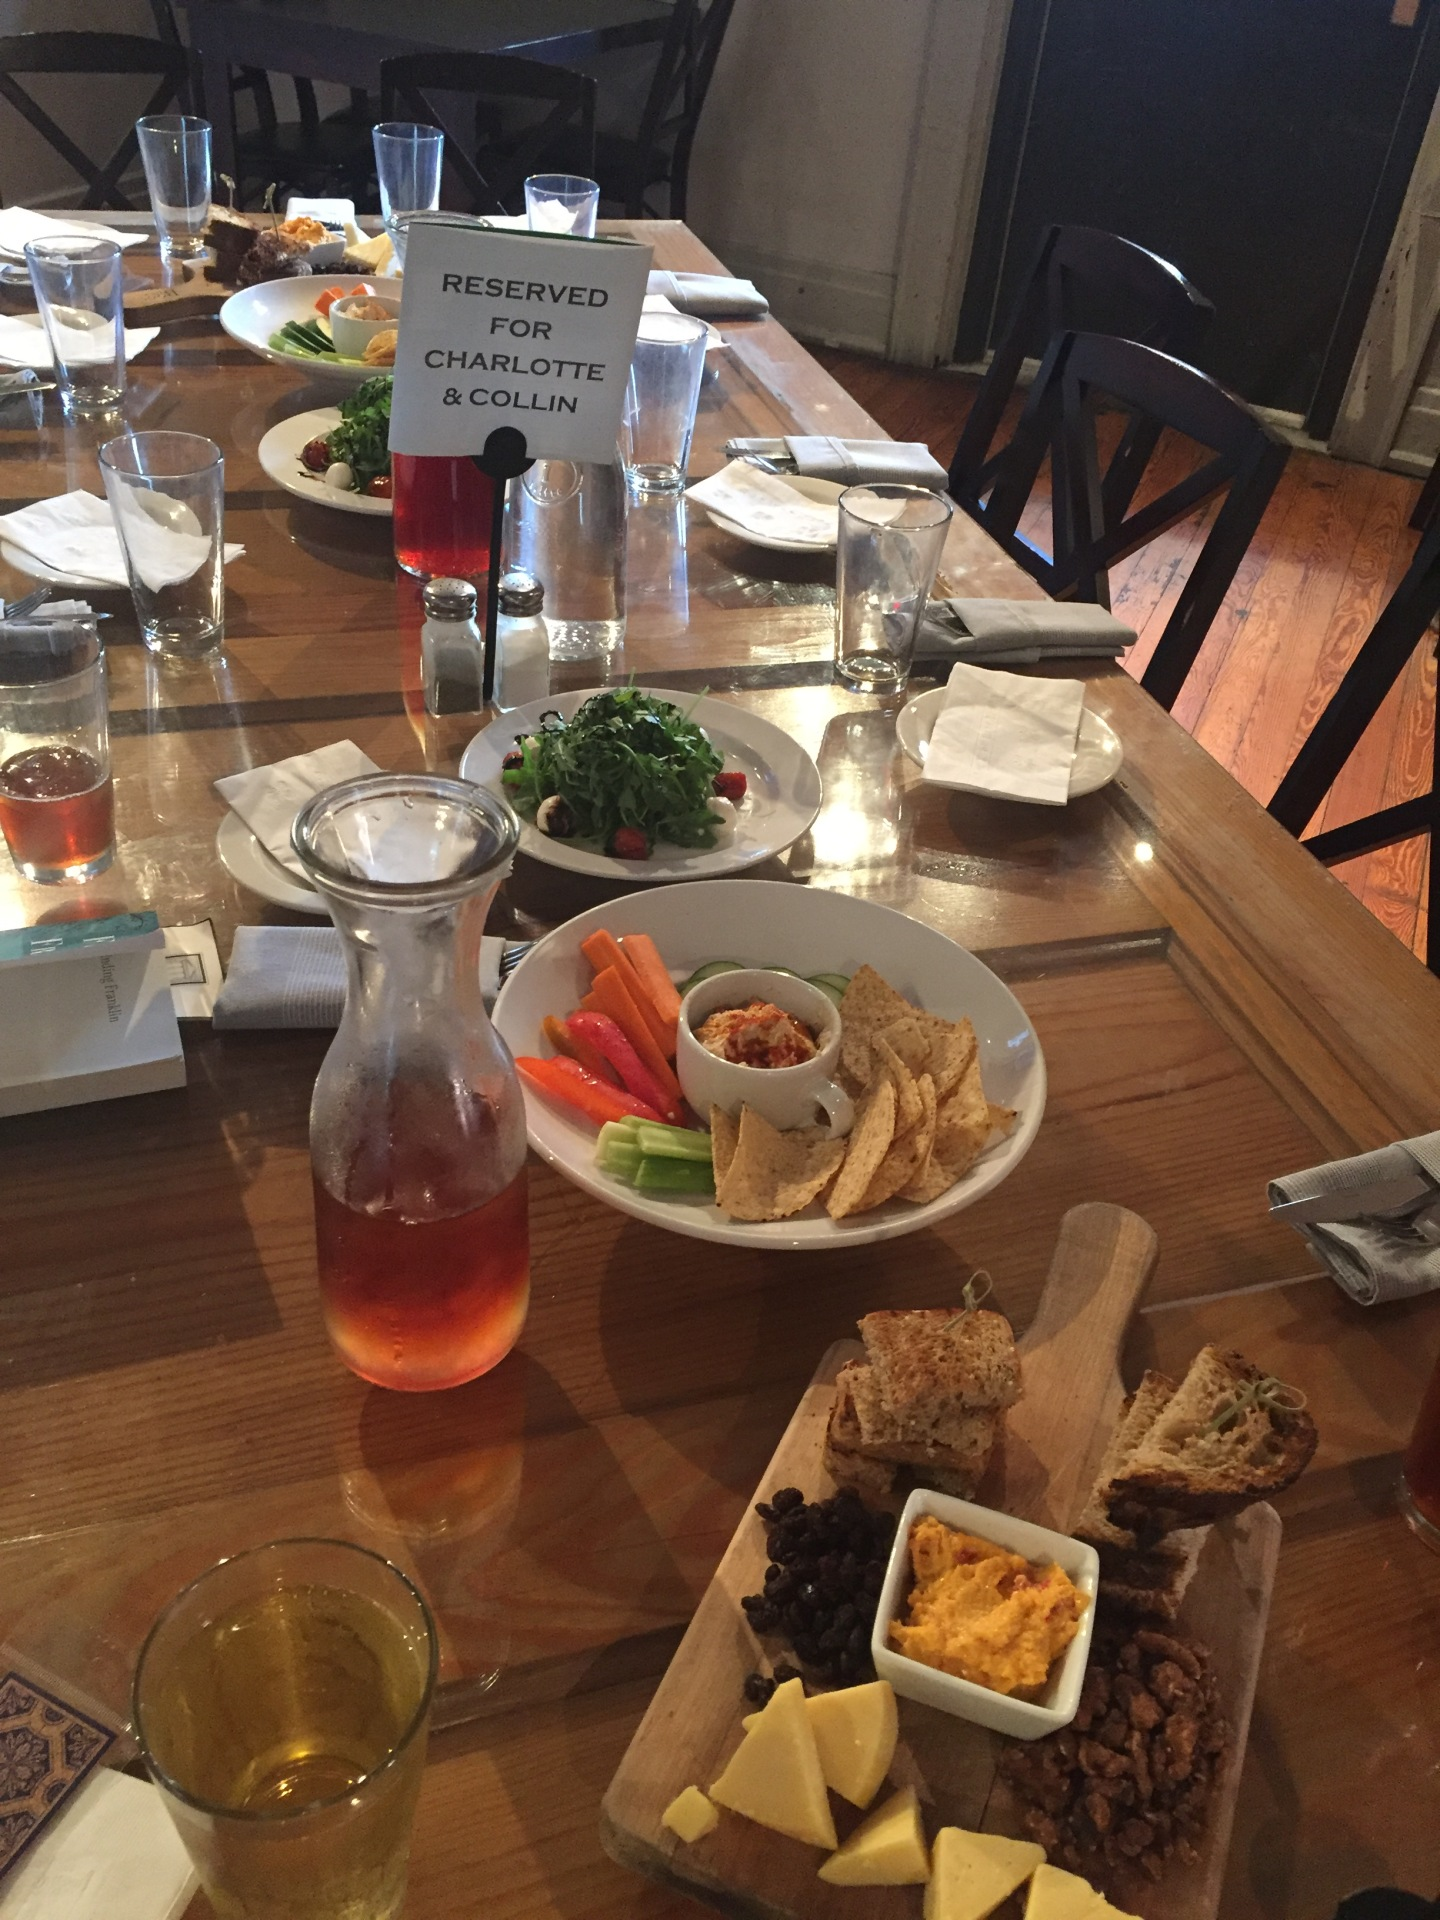 Food at book club meeting